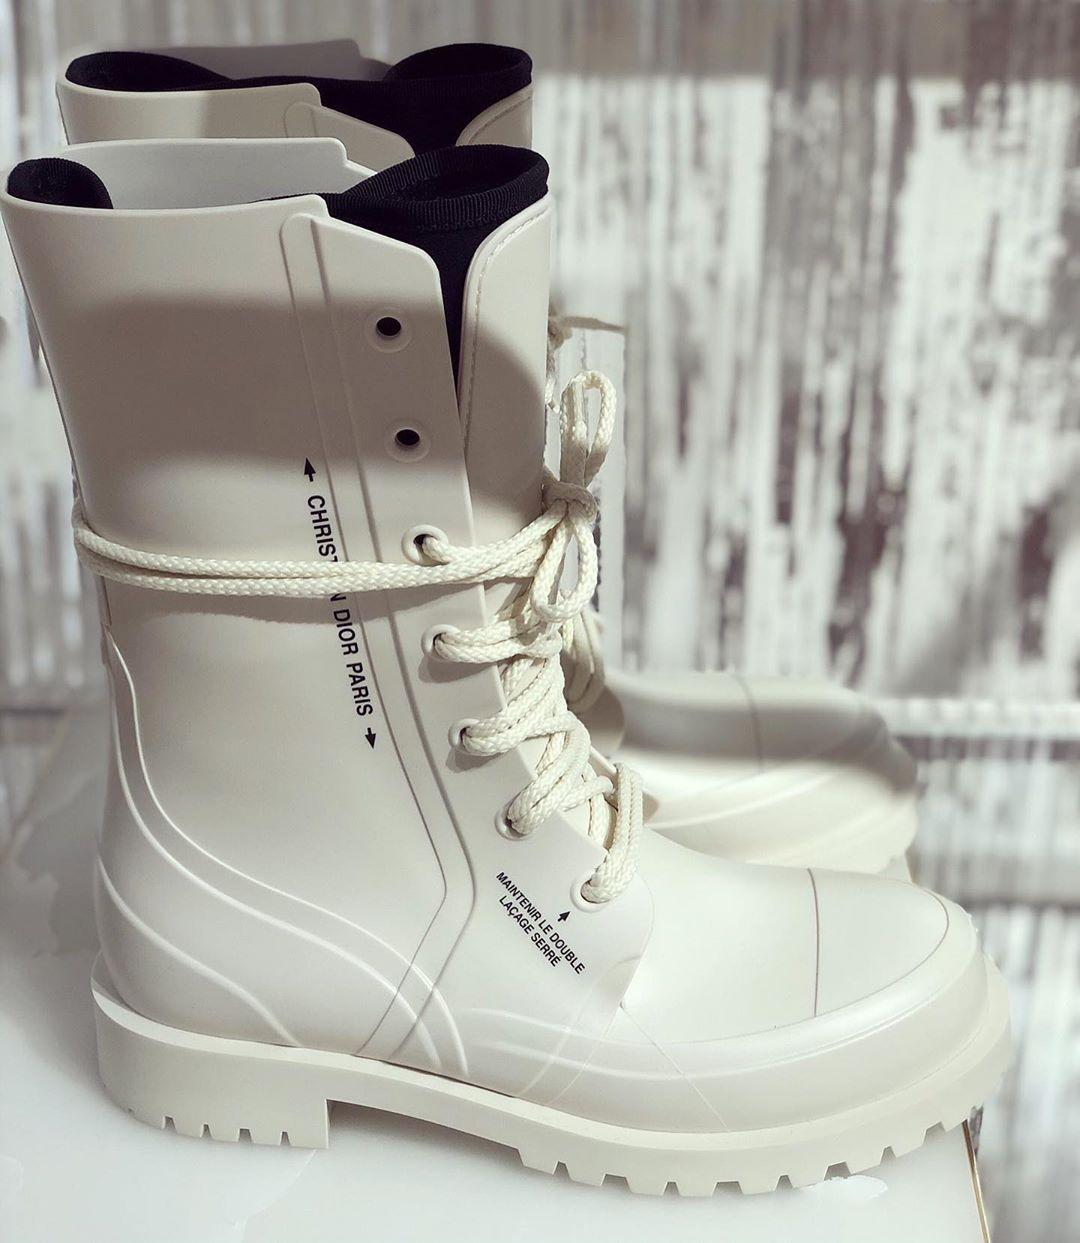 915 Dior shiny black rubber boots